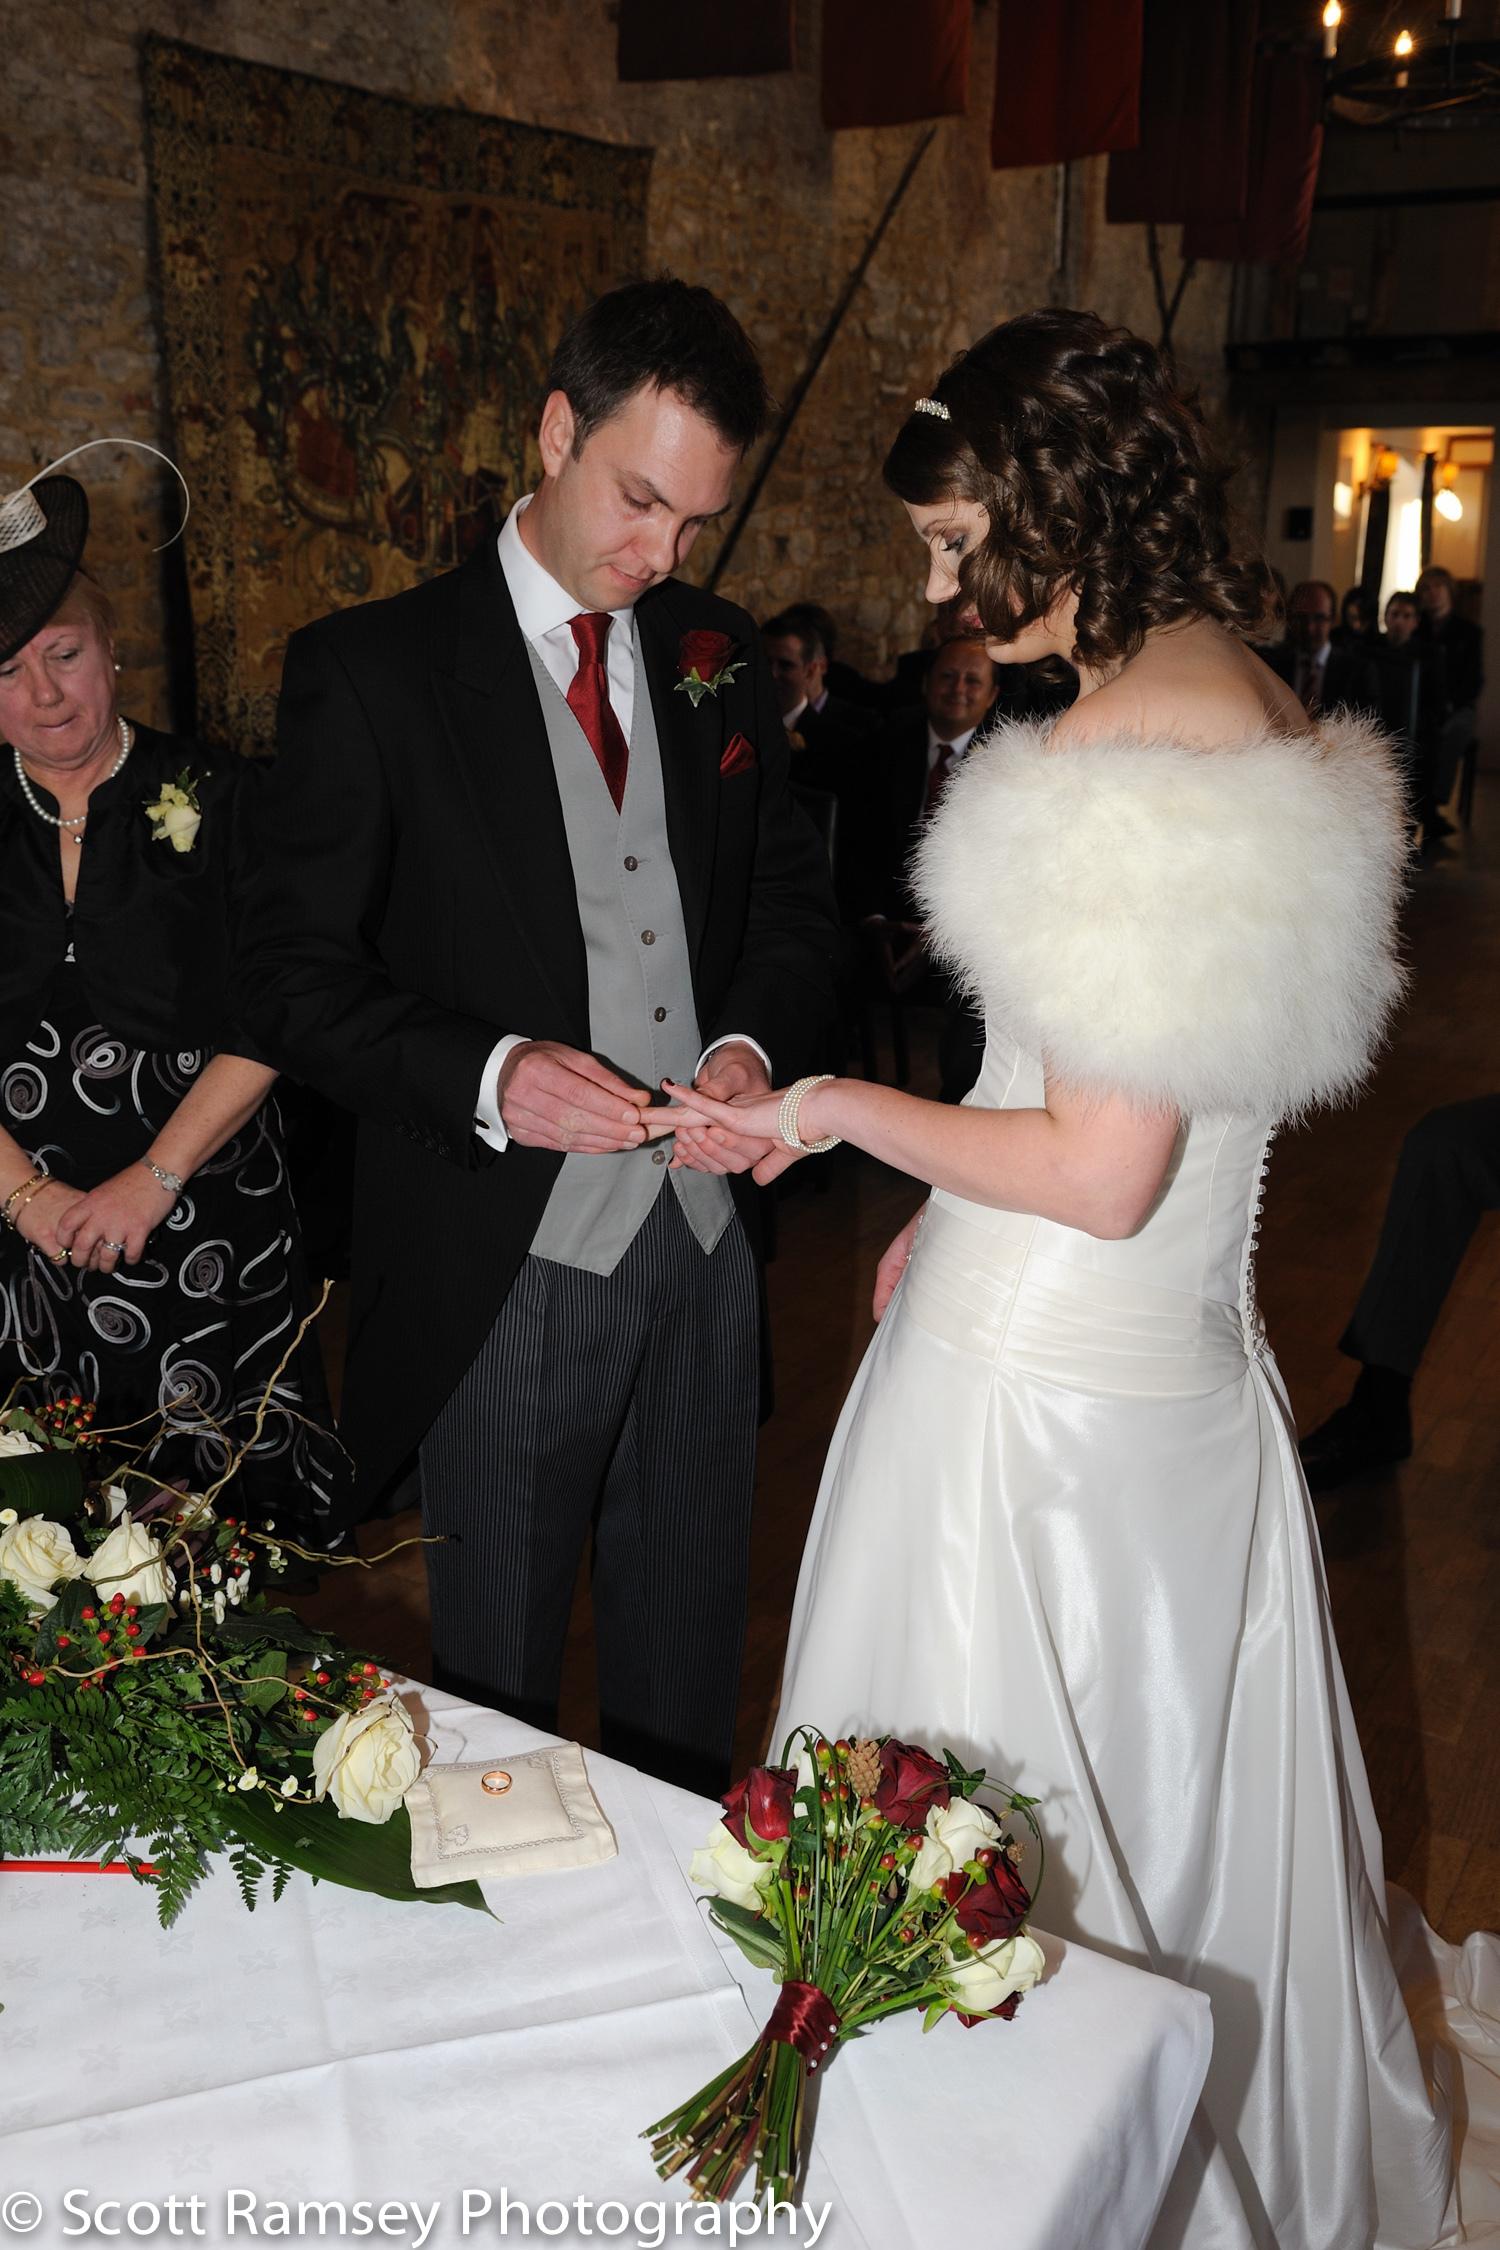 Winter-Wedding-Spread-Eagle-Hotel-Midhurst-Groom-Bride-Exchange-